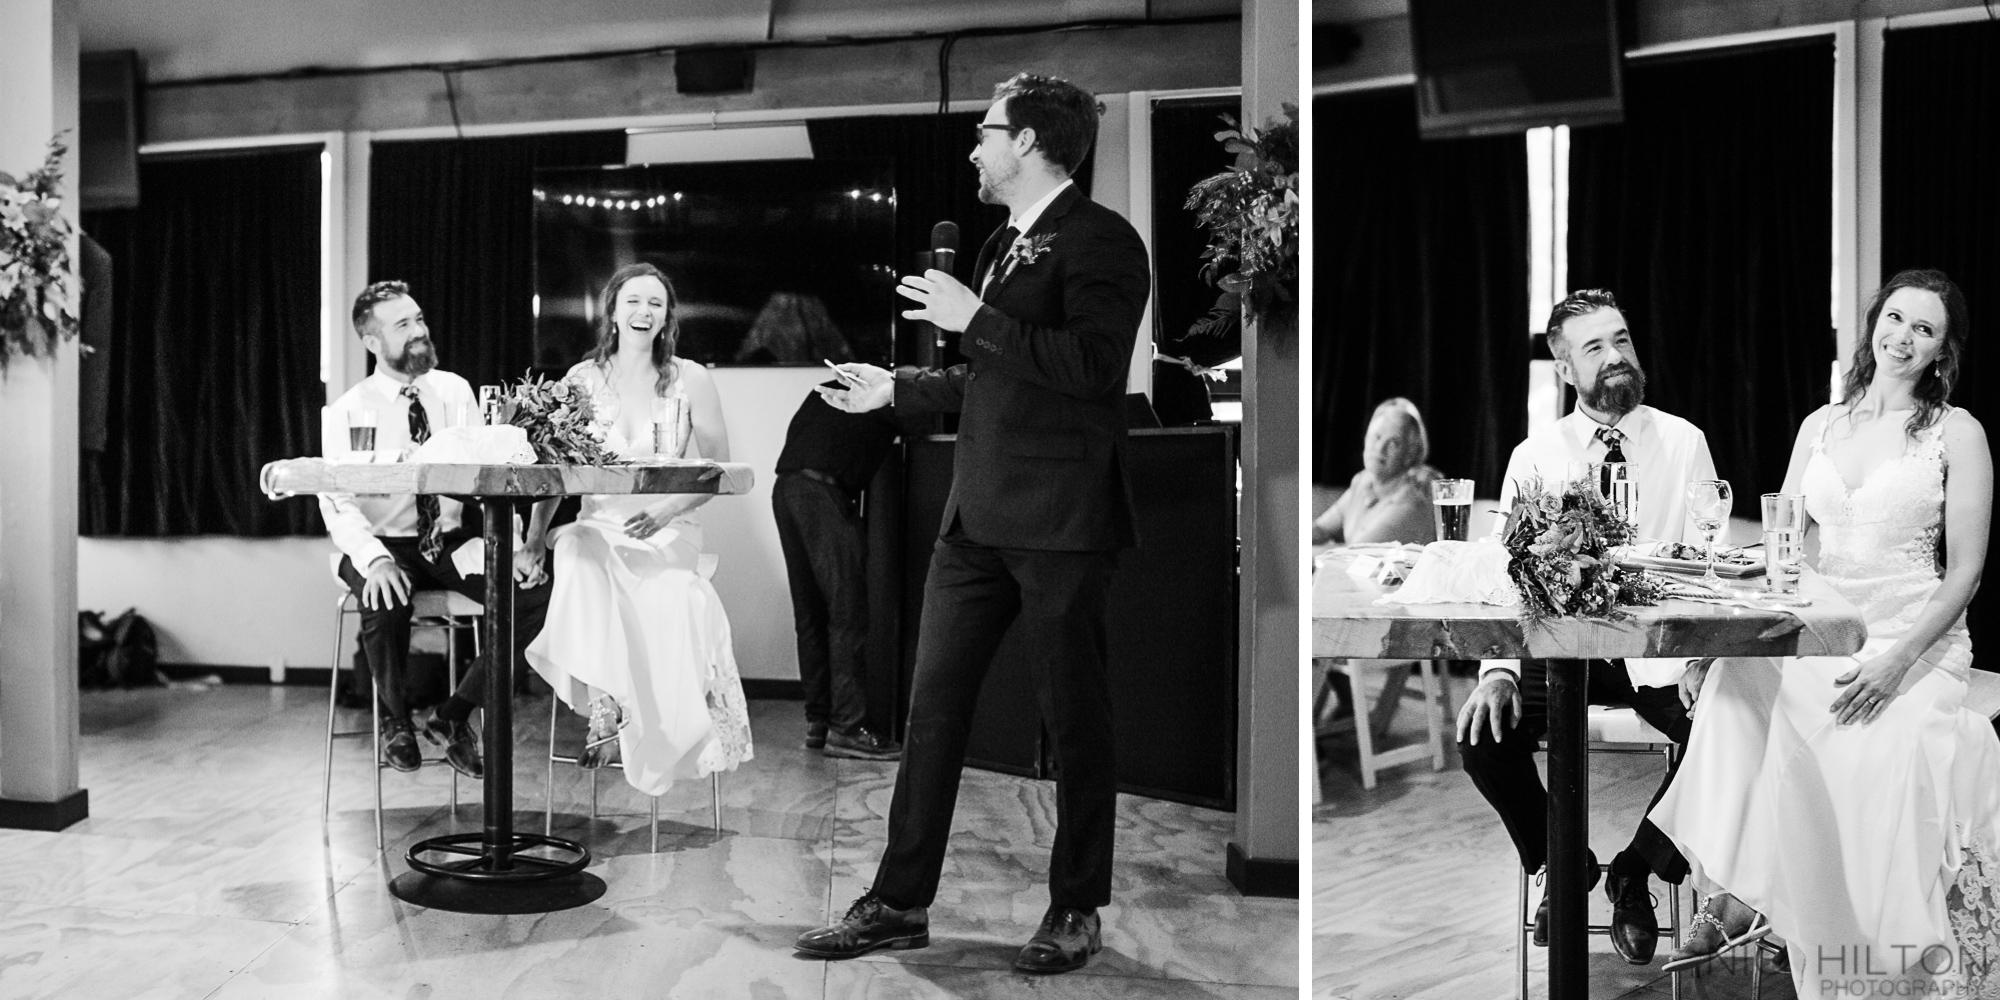 Mammoth-Brewery-Toasts-wedding-reception.jpg